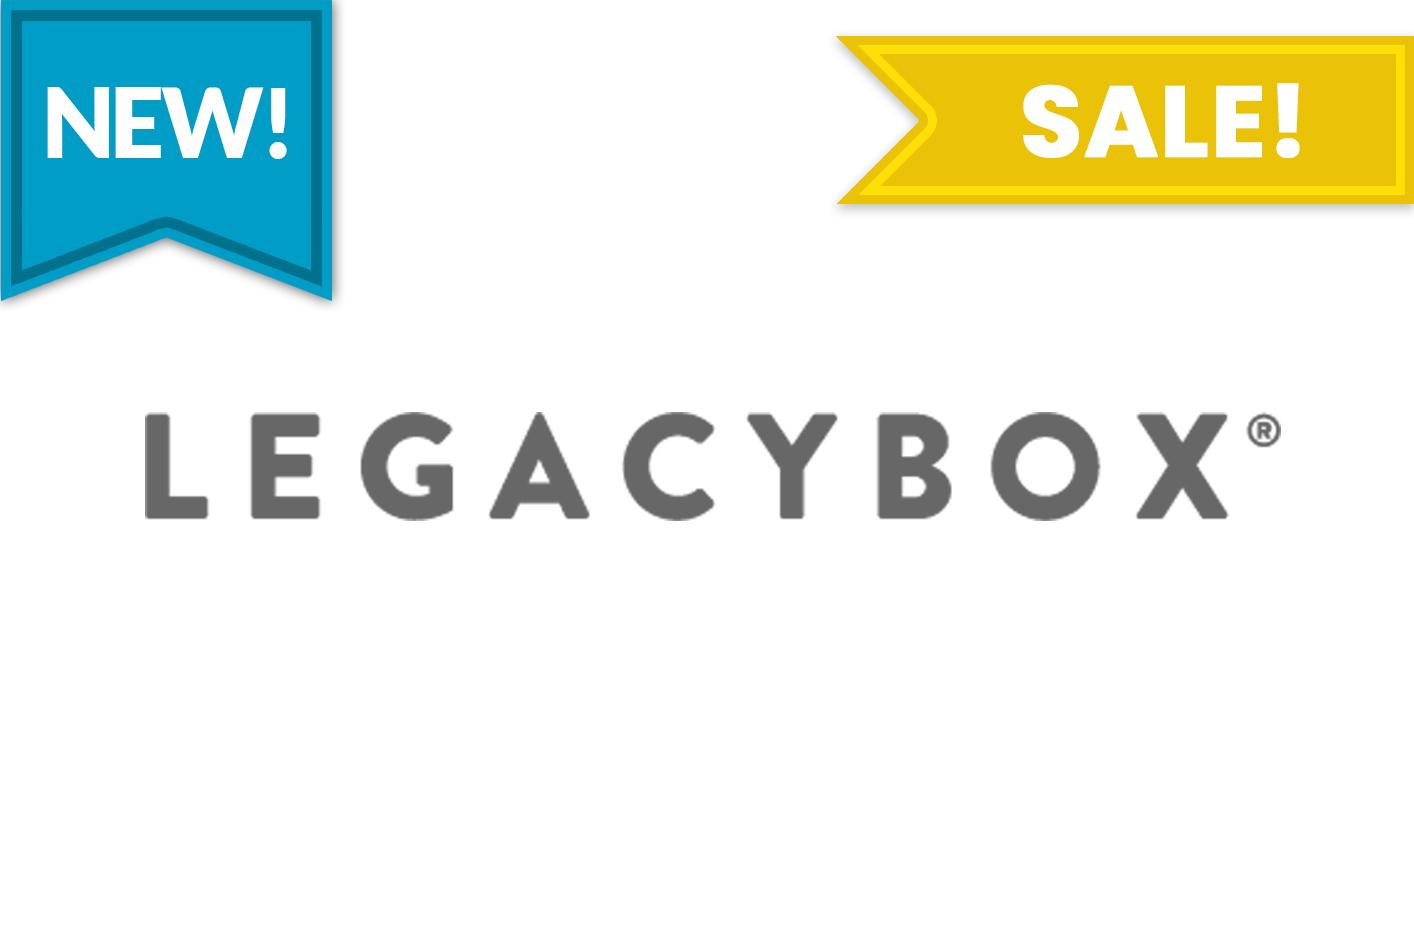 Legacybox_sale